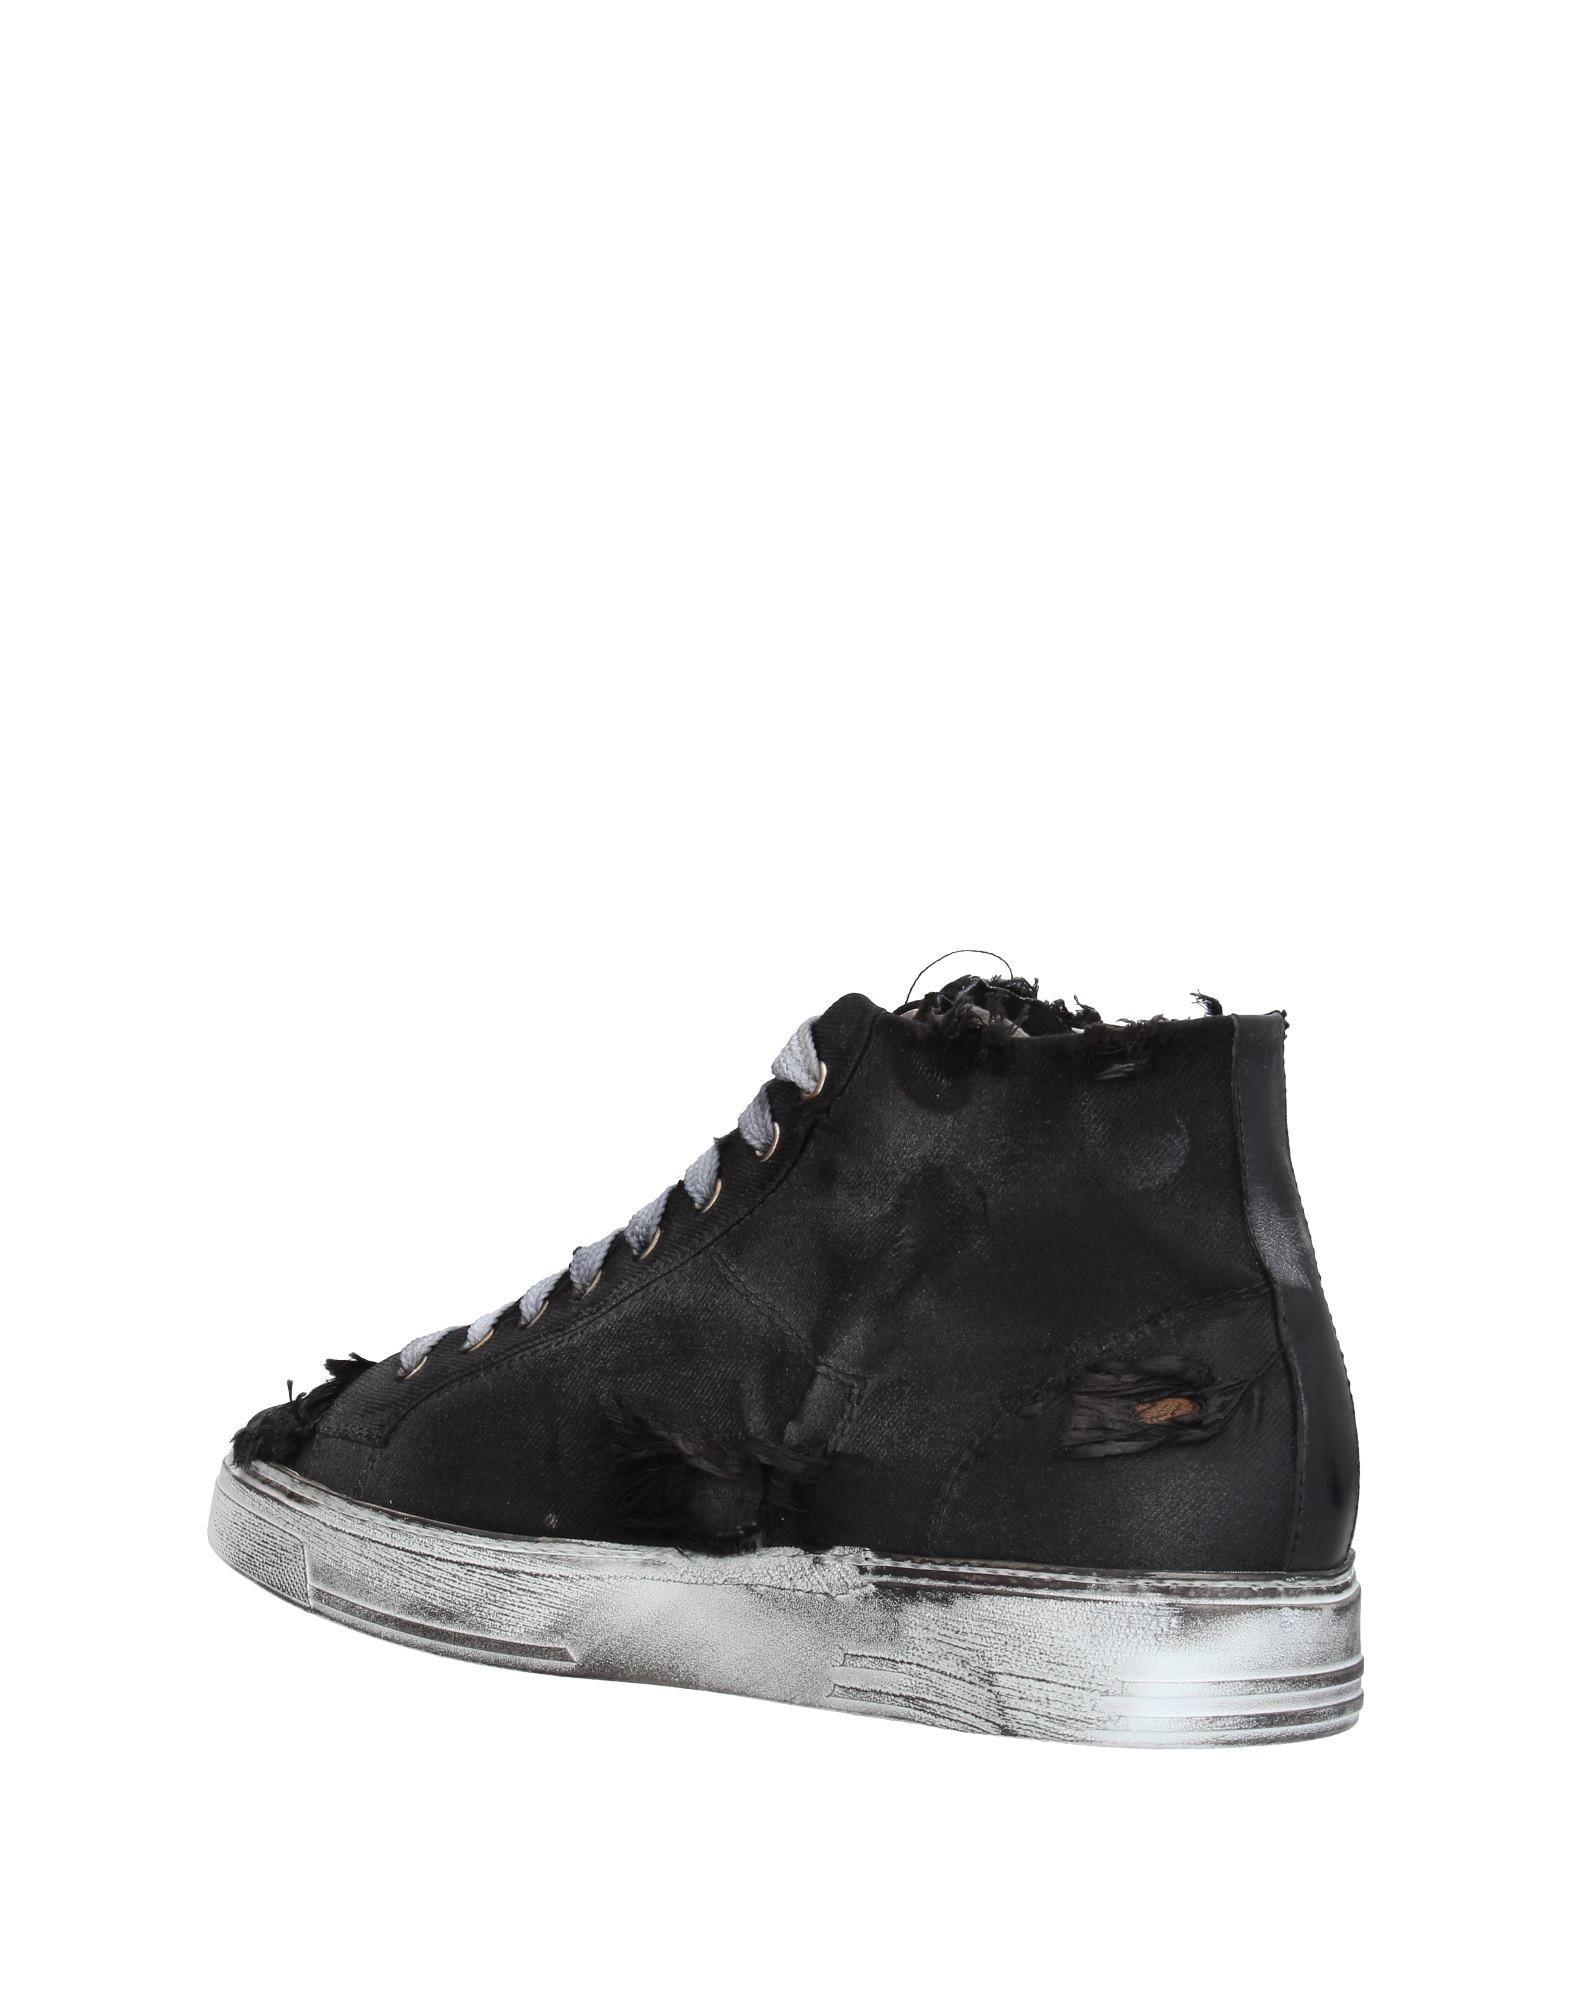 11402095PX Msgm Sneakers Herren  11402095PX  dc65fe